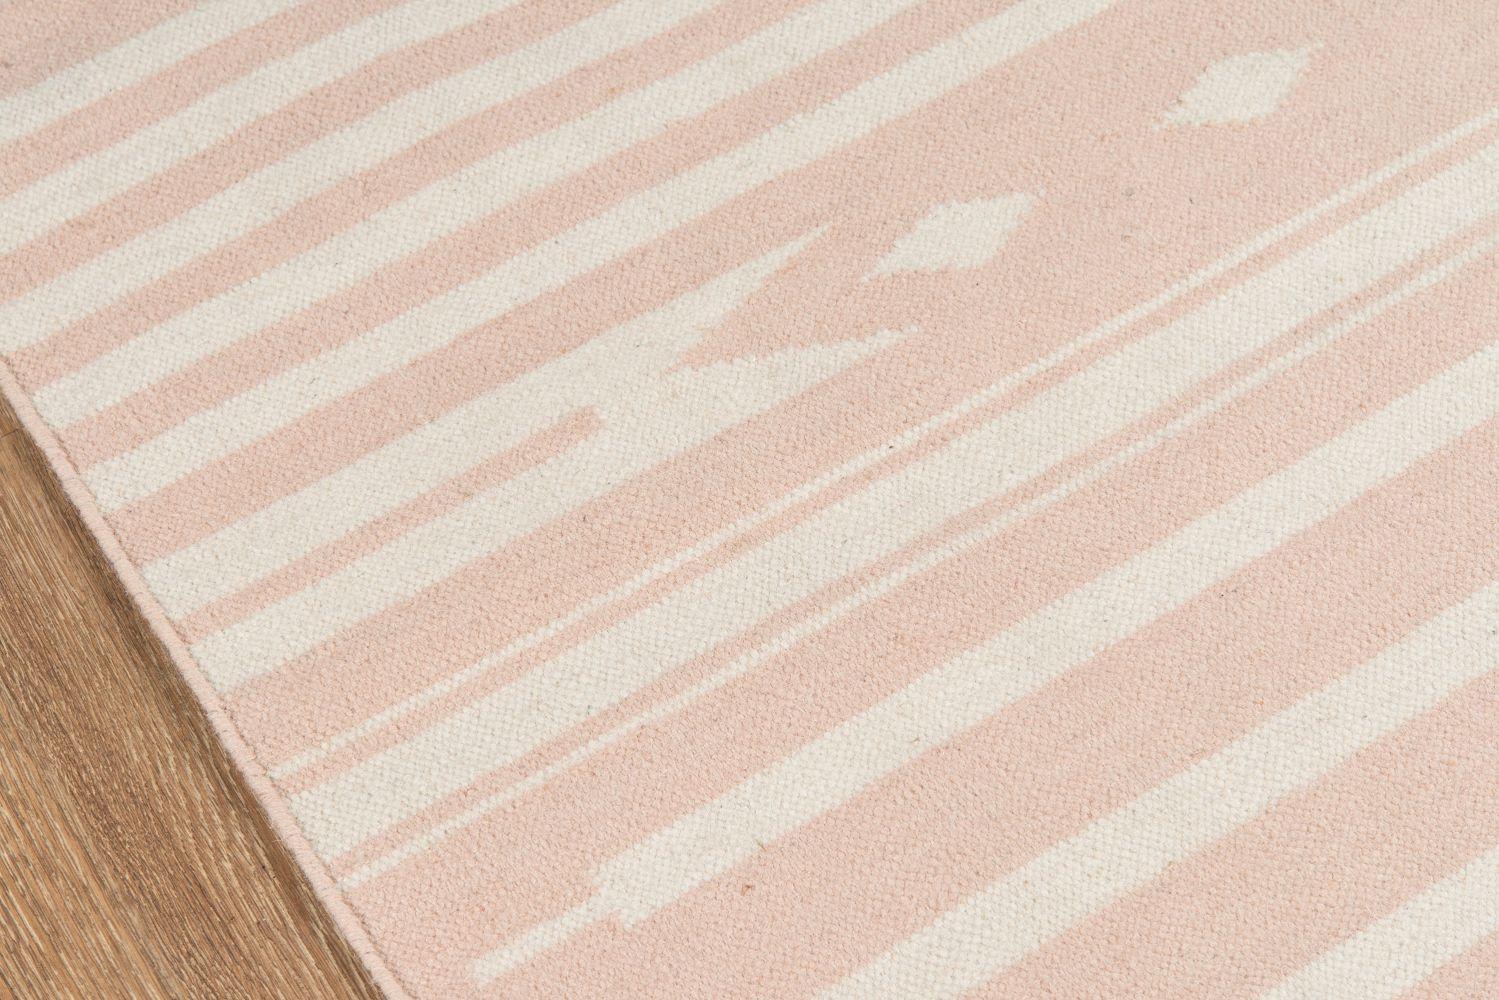 Erin Gates Thompson Tho-1 Billings Pink 5'0″ x 7'6″ THOMPTHO-1PNK5076